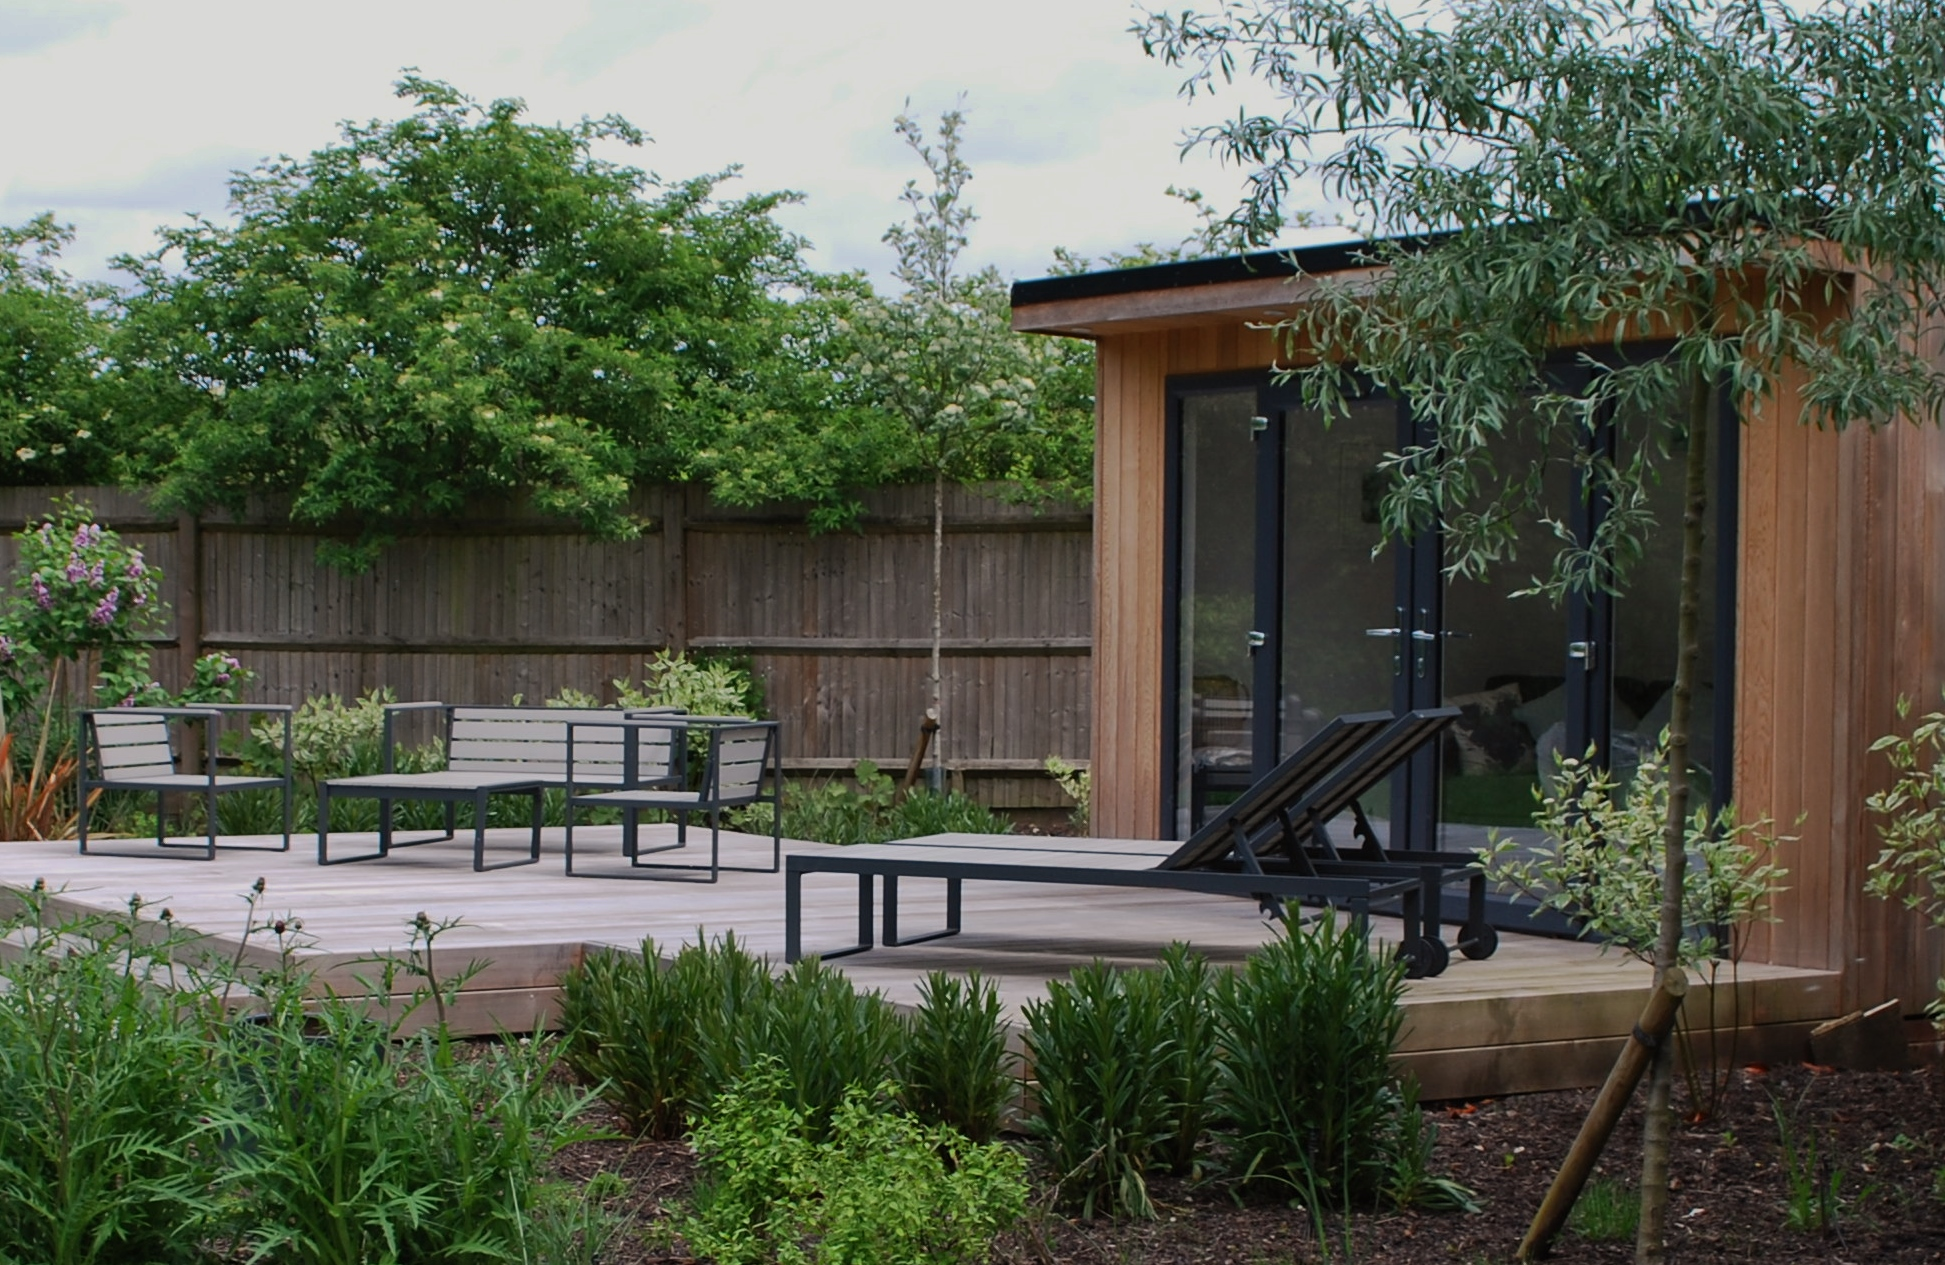 Holme grange farm jacqueline easton easton for Garden designs by jacqueline